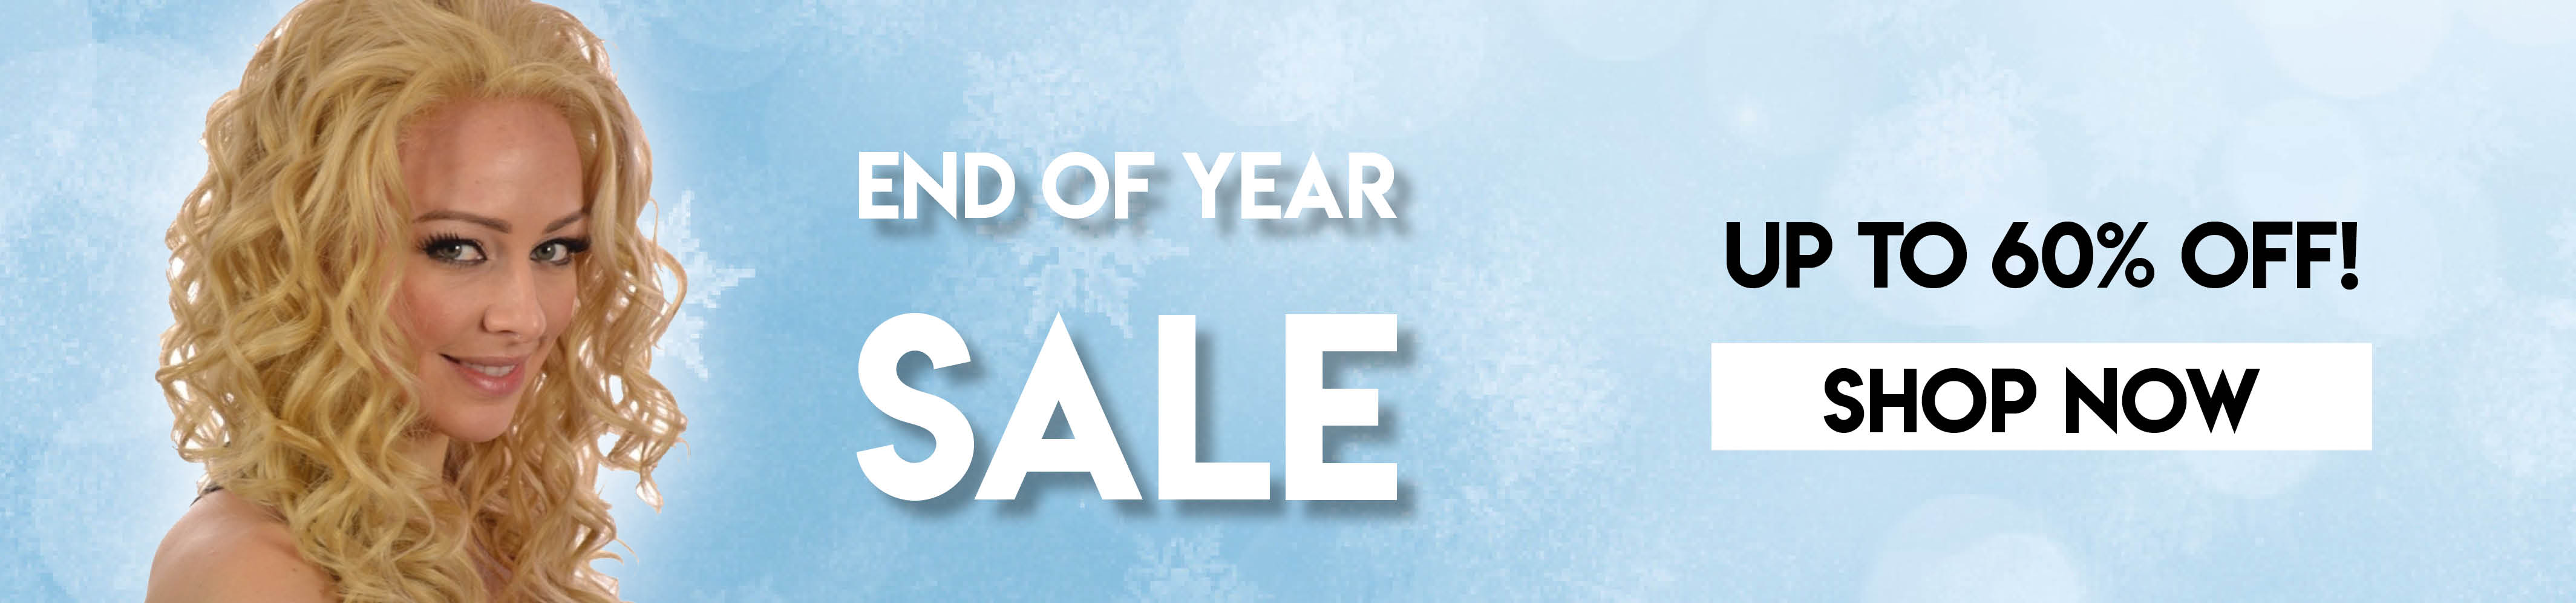 end-of-year-sale-celeb-wigs-2.jpg